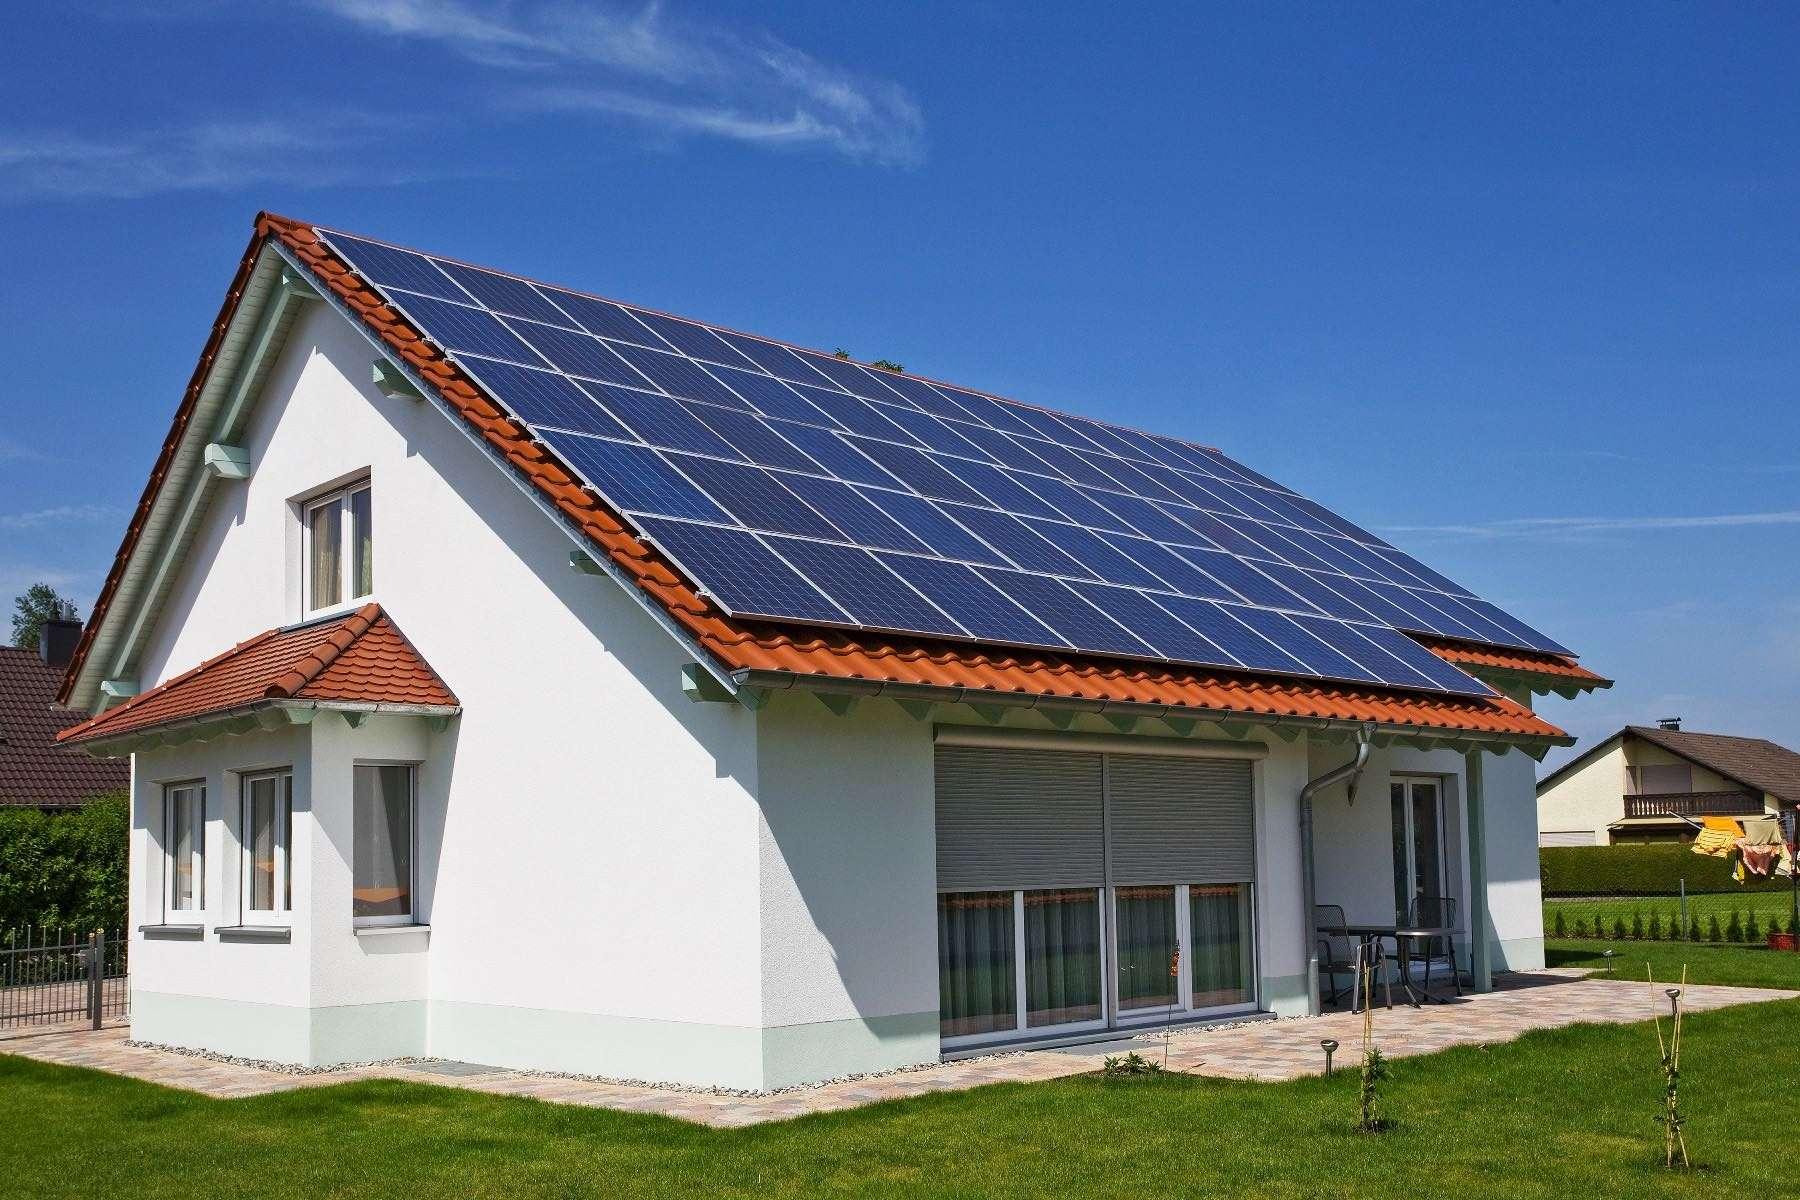 solar panel cost savings